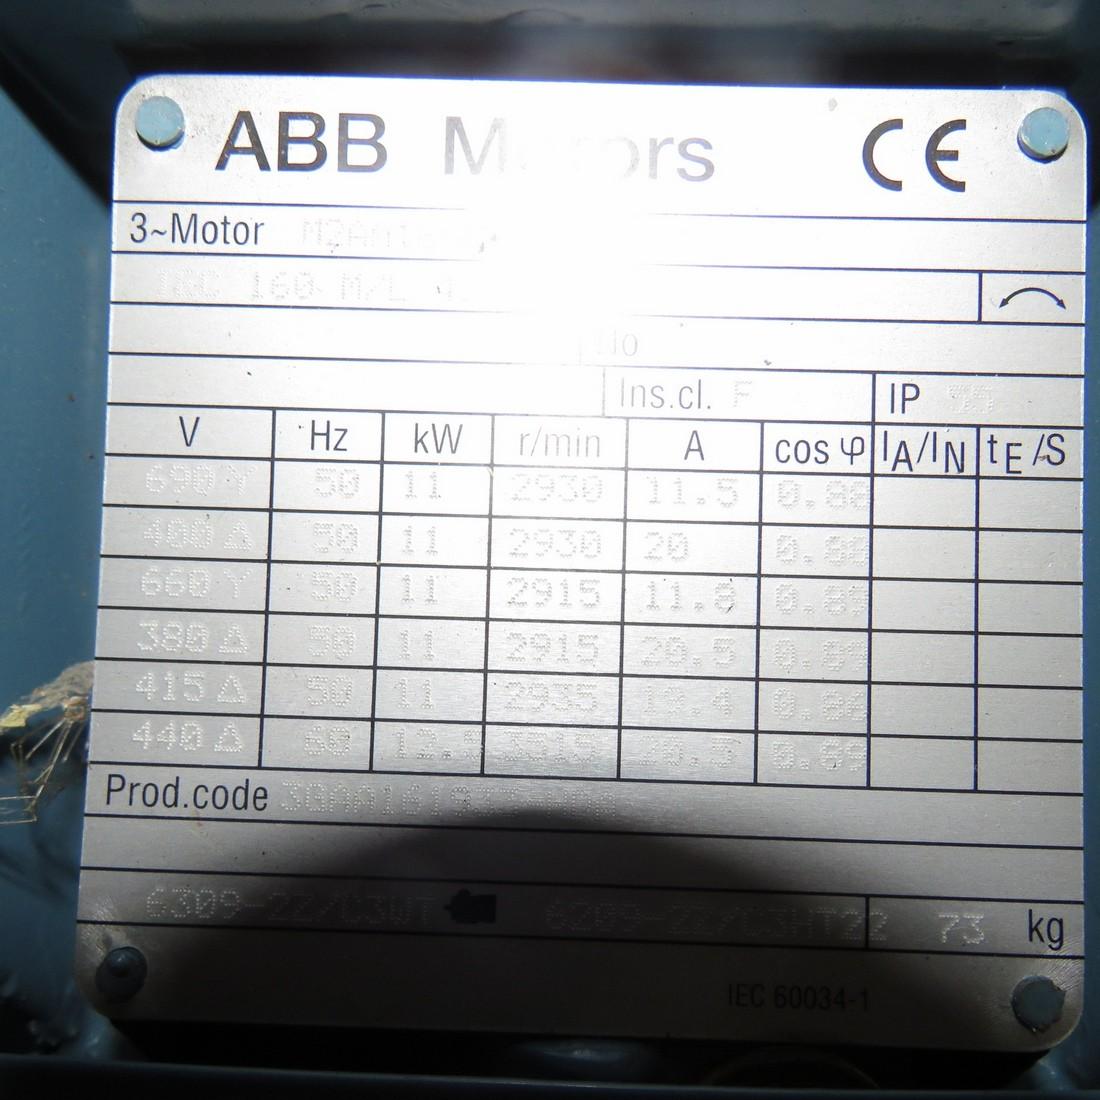 R10VA1285 Stainless steel ALFA LAVAL centrifugal pump - Hp15 - Rpm3000